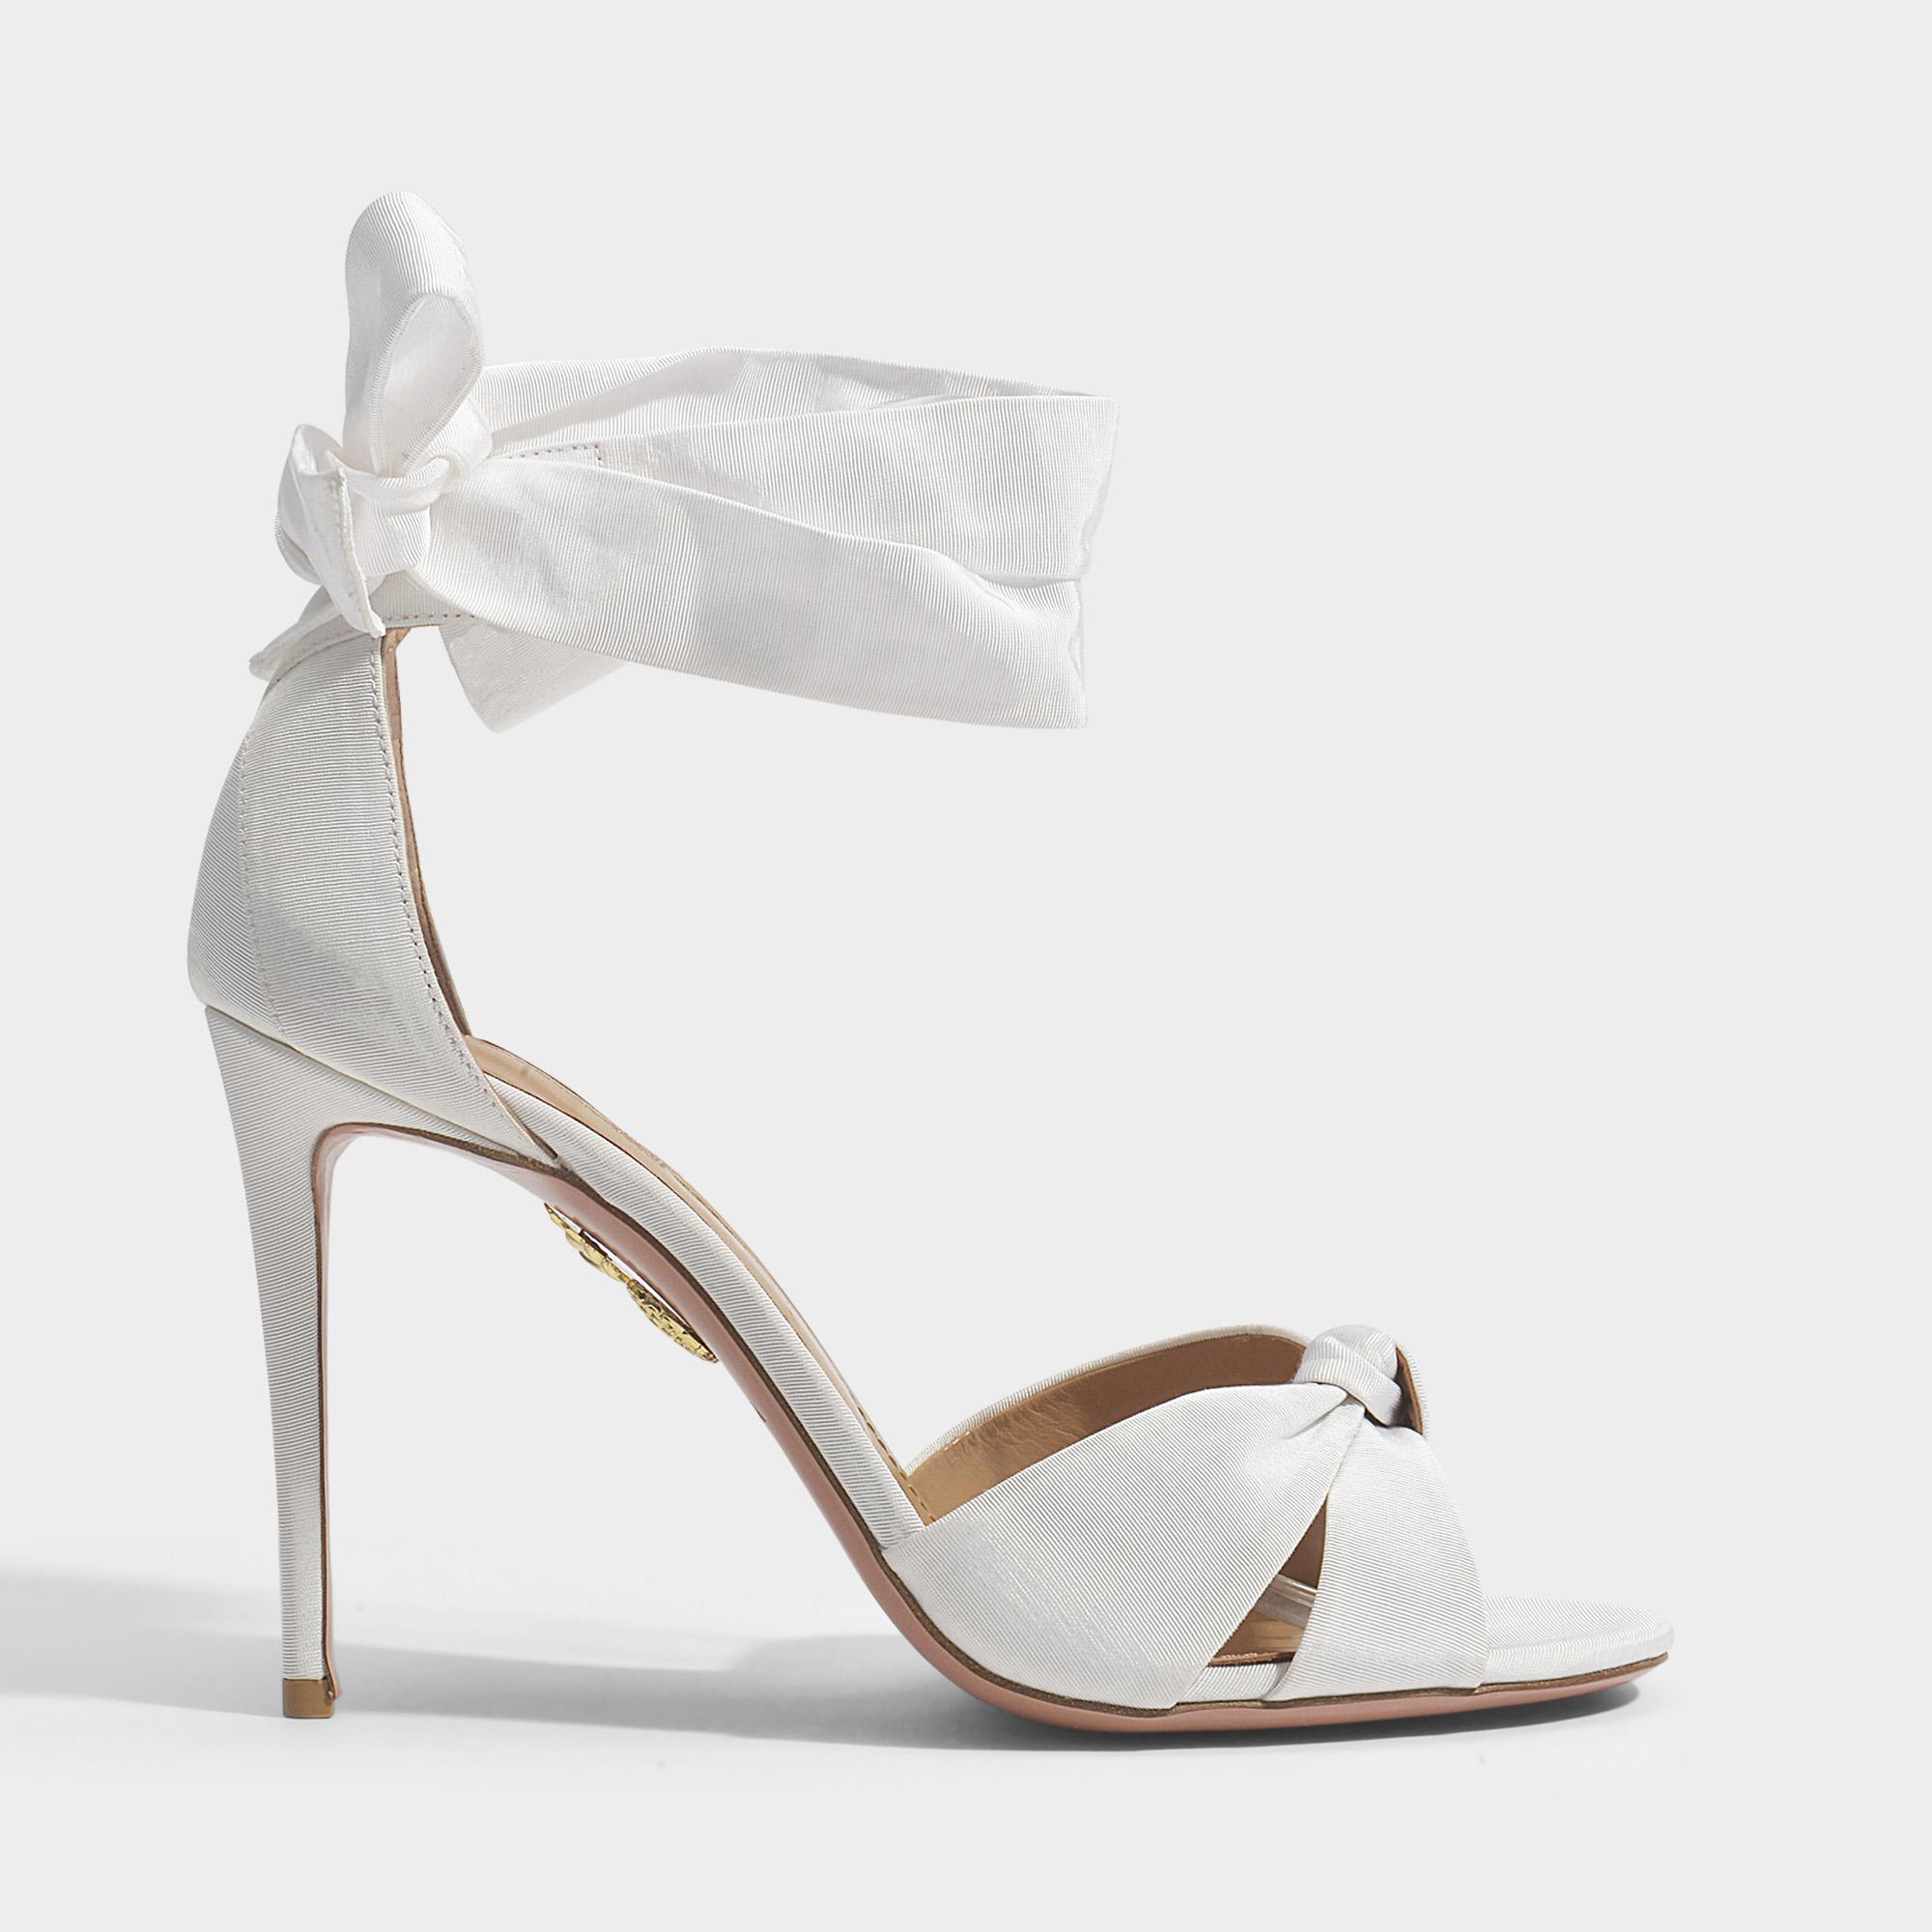 ca5c2ab002d0 Lyst - Aquazzura All Tied Up 105 Sandals In White Gros Grain in White